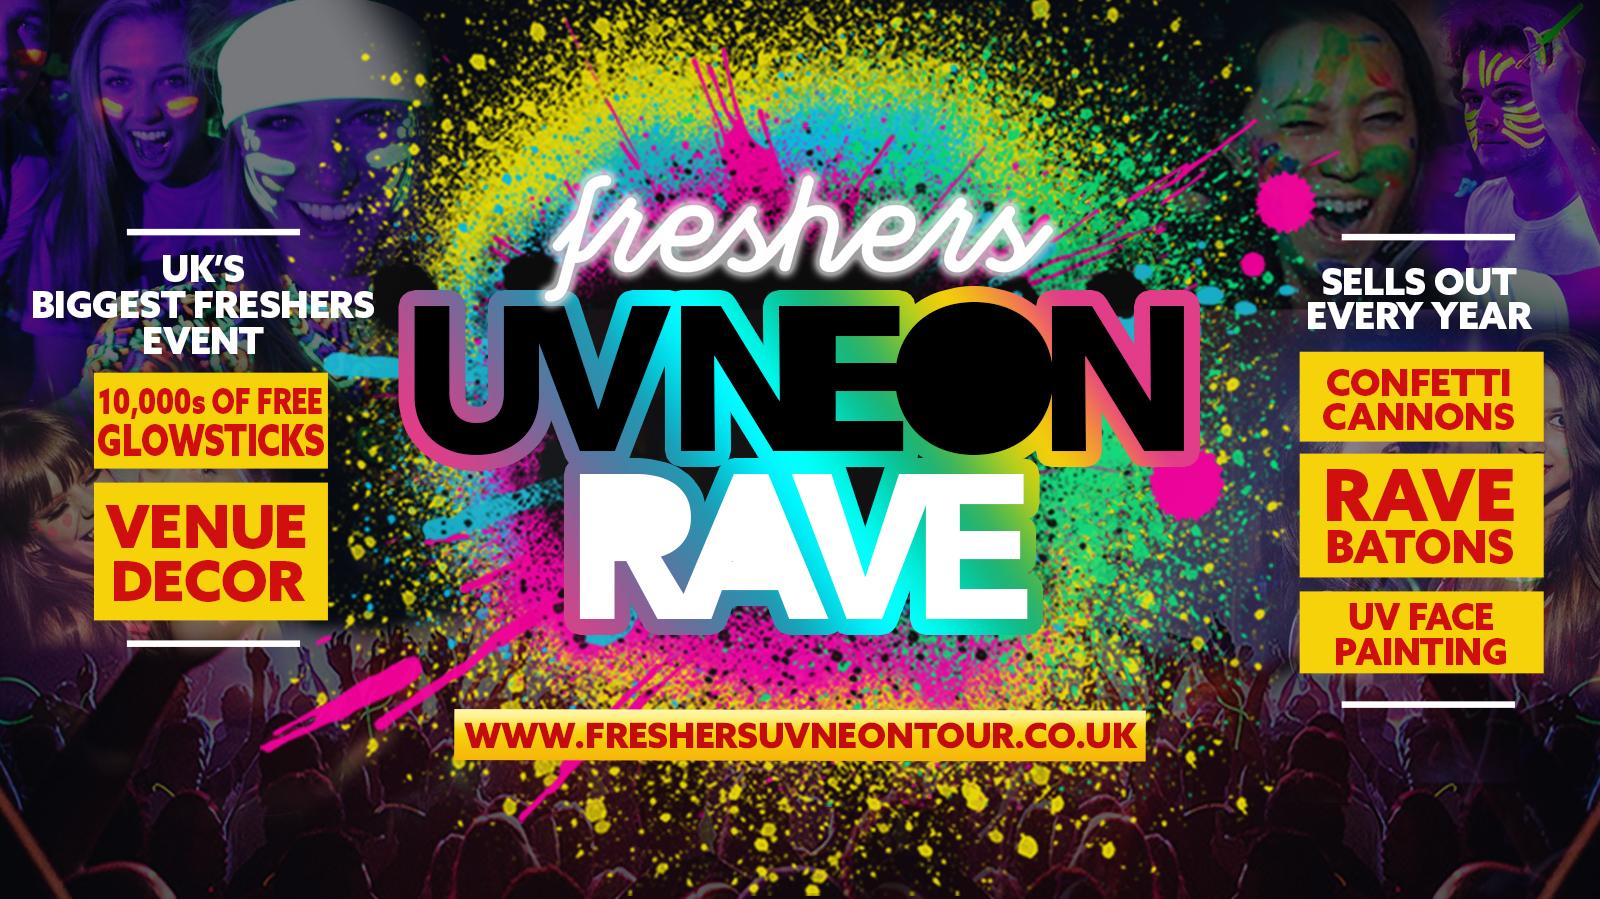 Freshers UV Neon Rave 2021 | UK Tour Tickets On Sale!